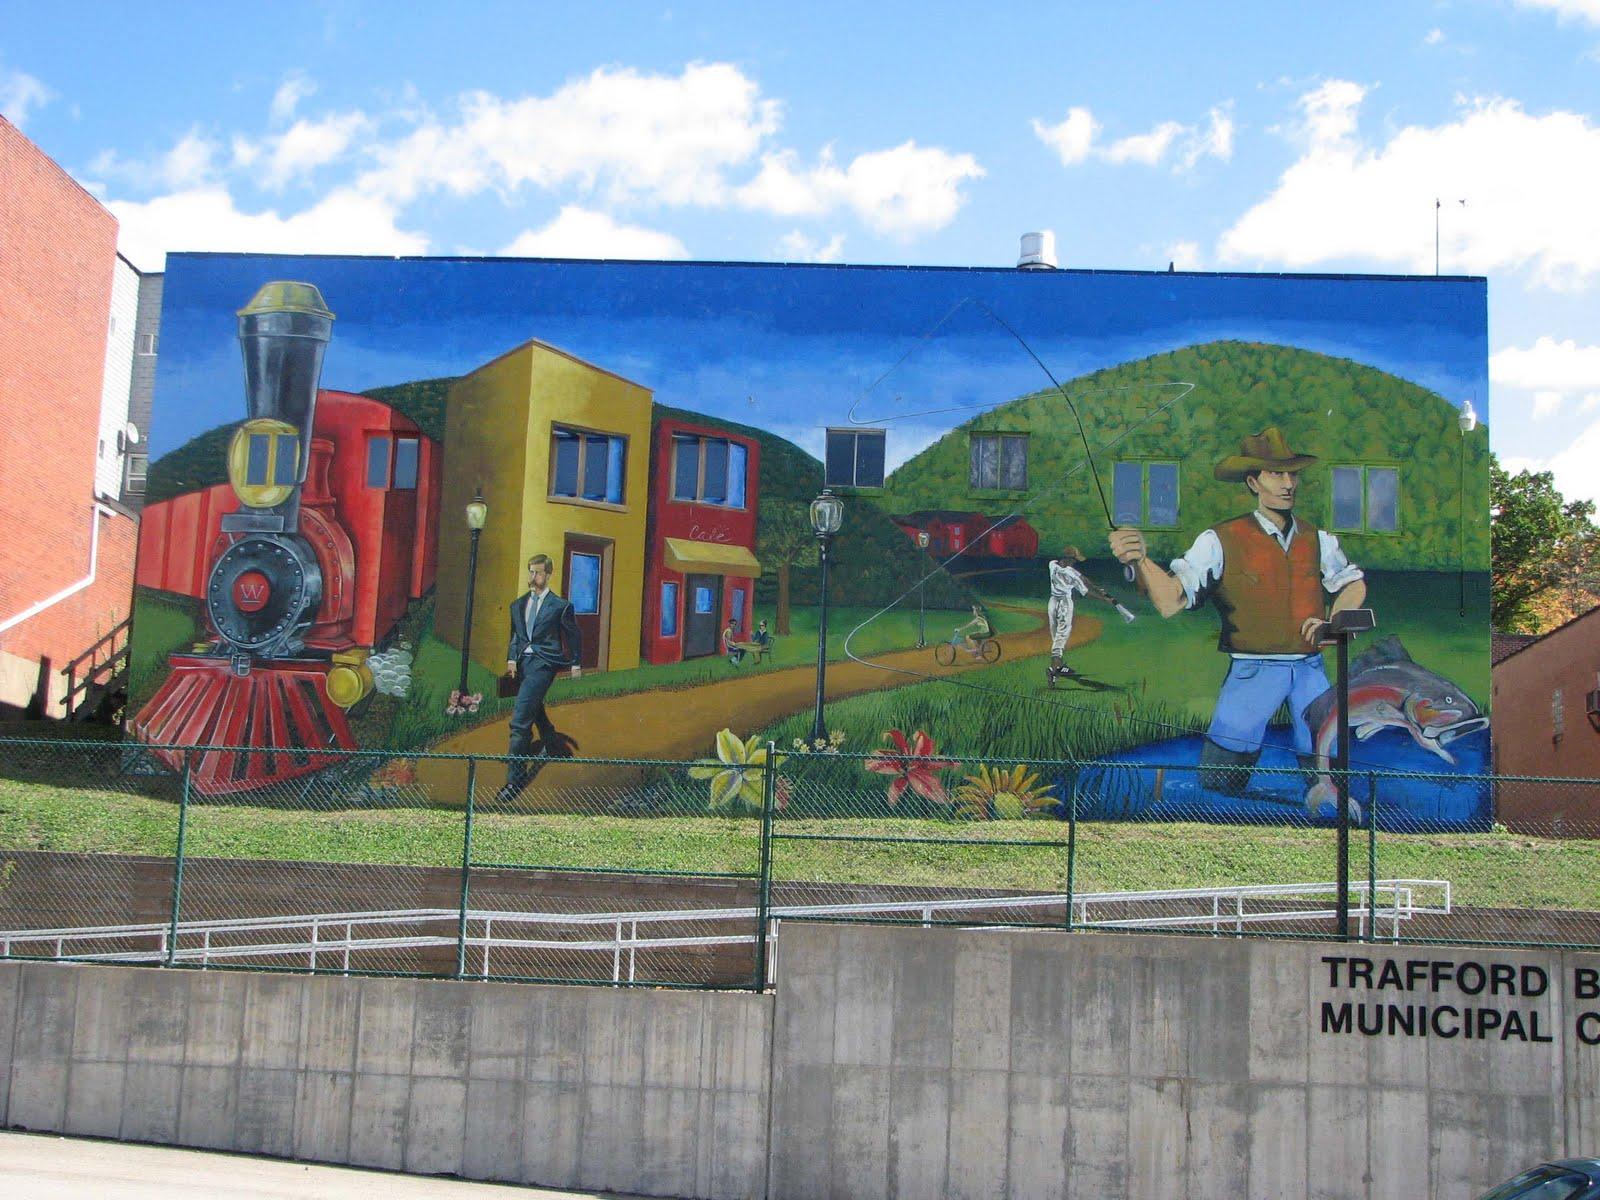 Trafford, PA 2010.jpg